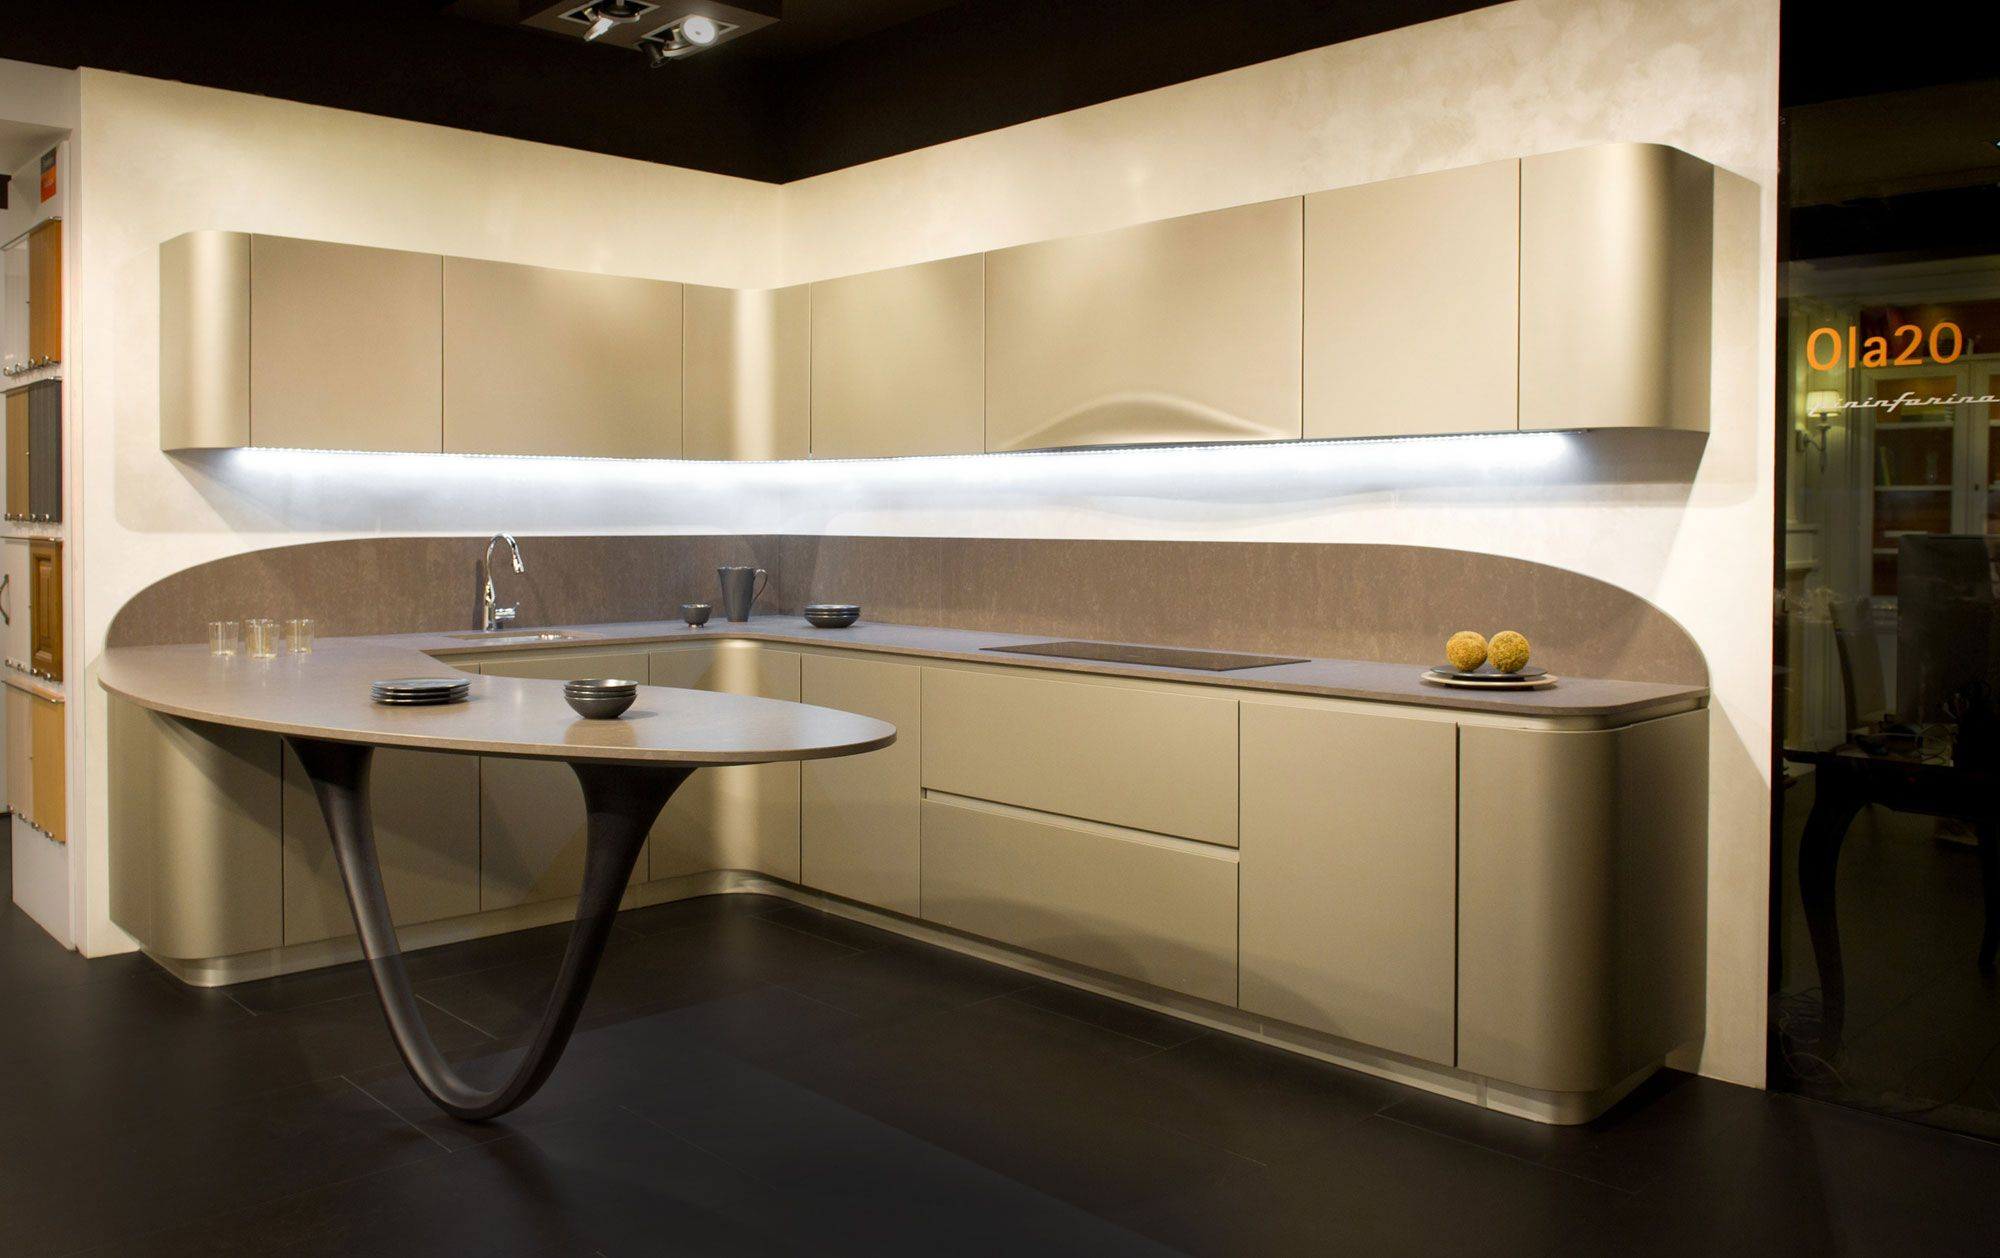 kitchen Ola20 at Snaidero Centr Kuhni | Beautiful, good, valuable ...